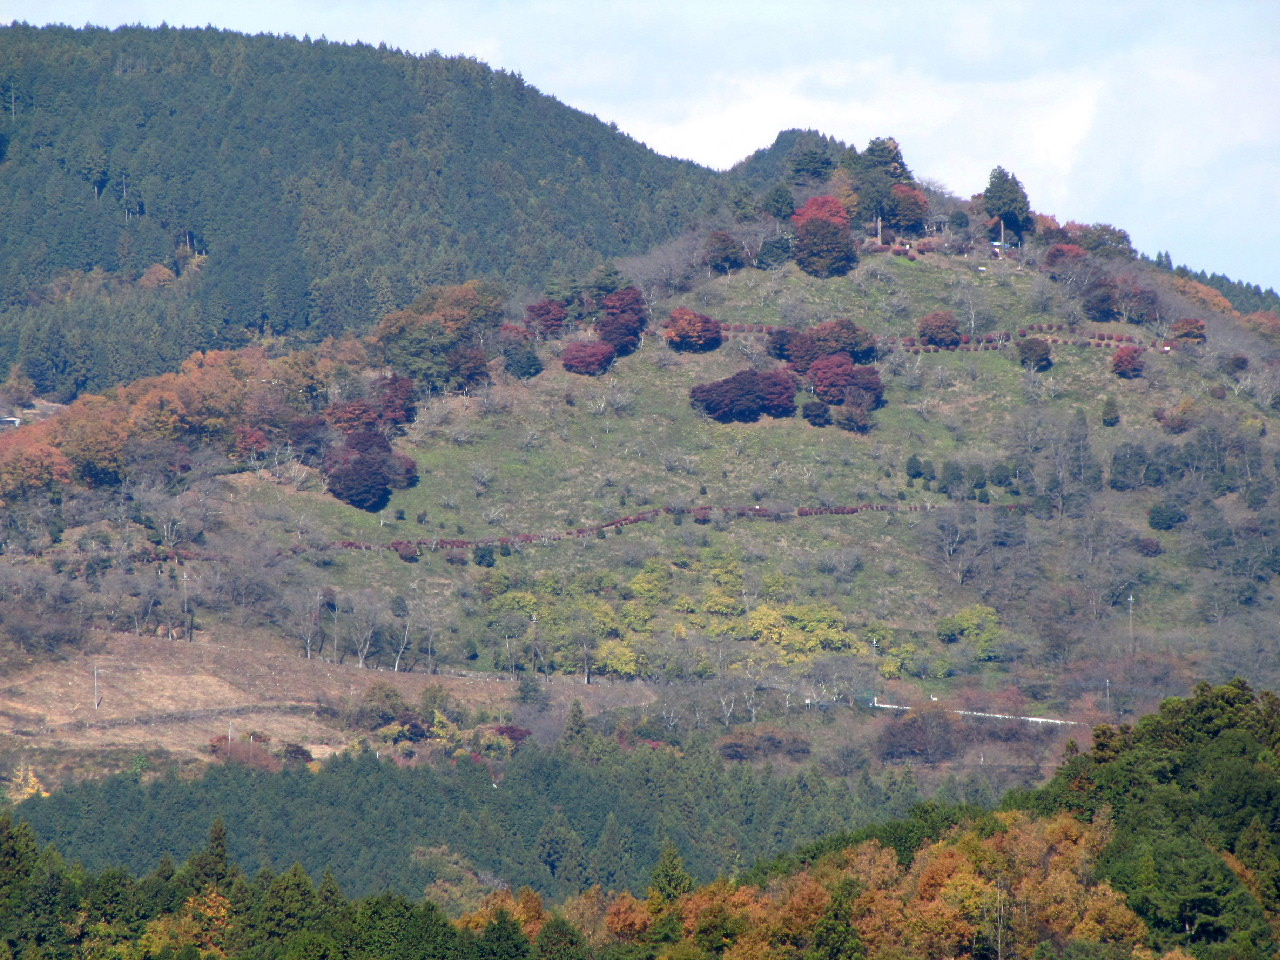 http://hakkaisan-photo.com/q/fuyuzakura/2012.11.20%EF%BC%A2%20-%20%20020%E3%80%80%E5%9F%8E%E5%B3%AF%E5%B1%B1%E5%85%AC%E5%9C%92.JPG